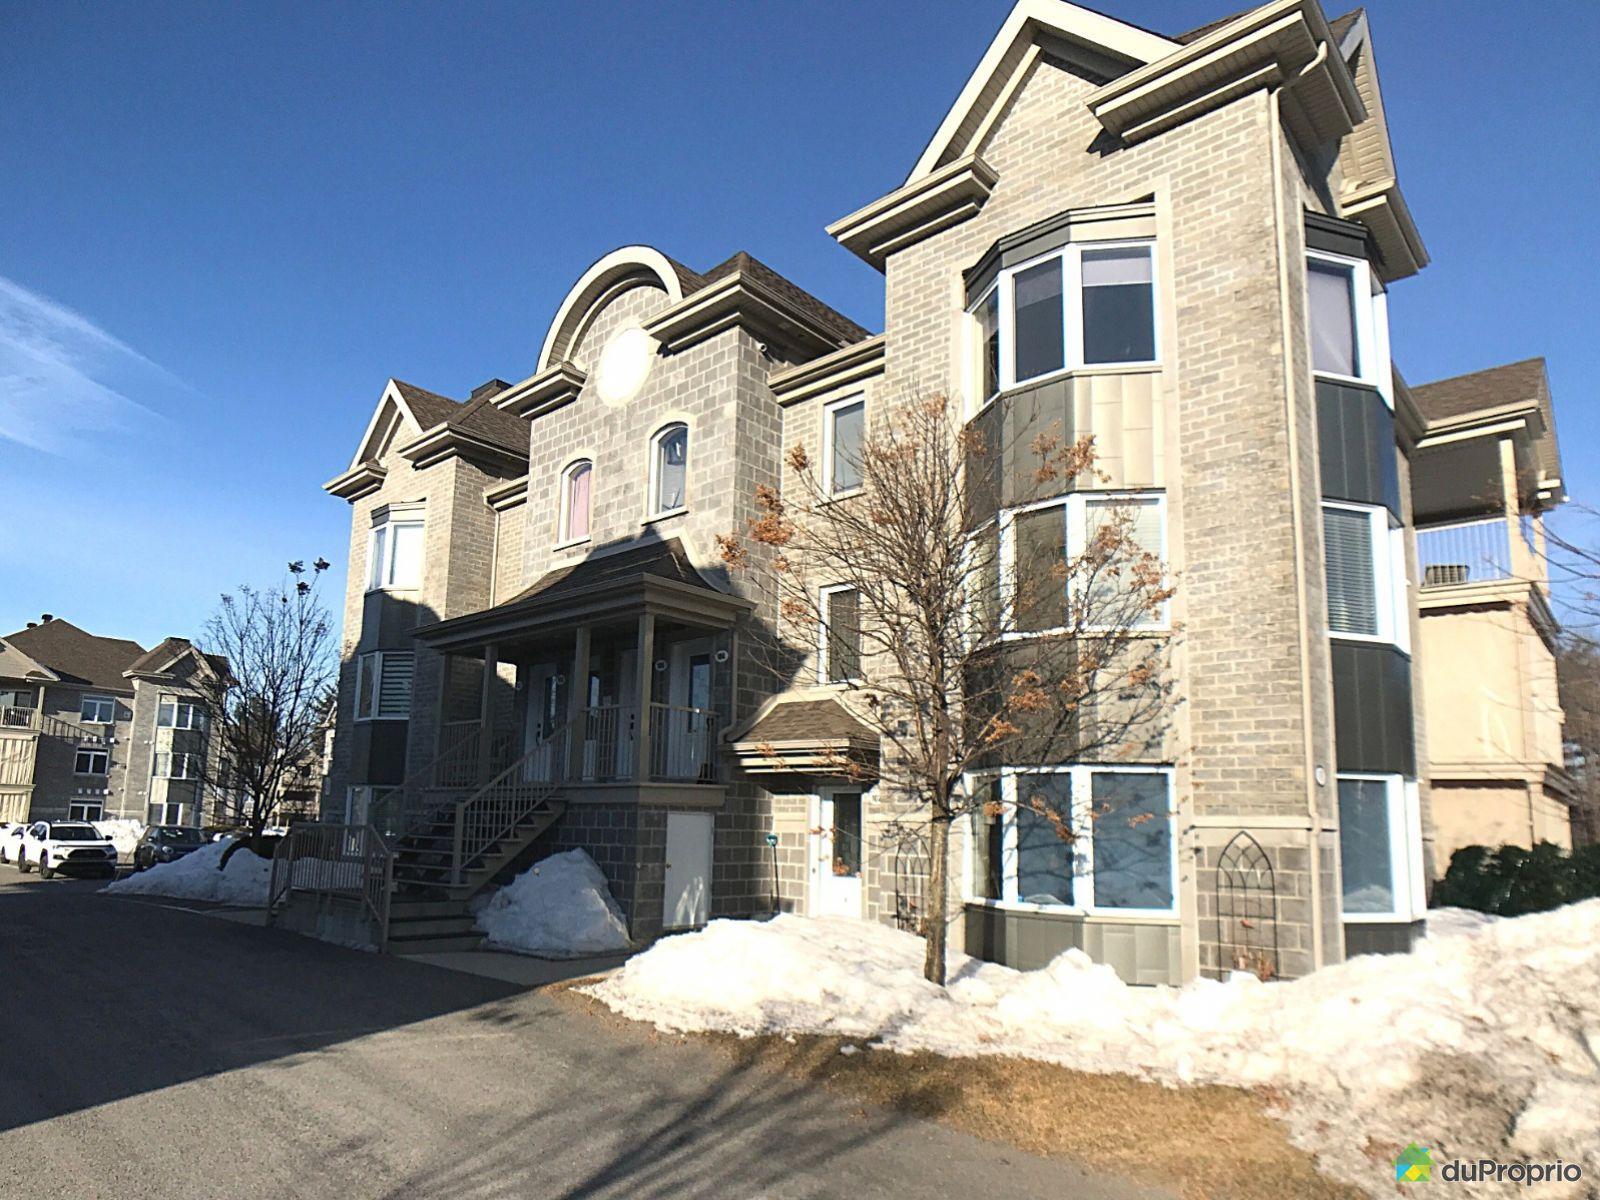 106-87, rue Hubert-Aquin, Blainville à vendre